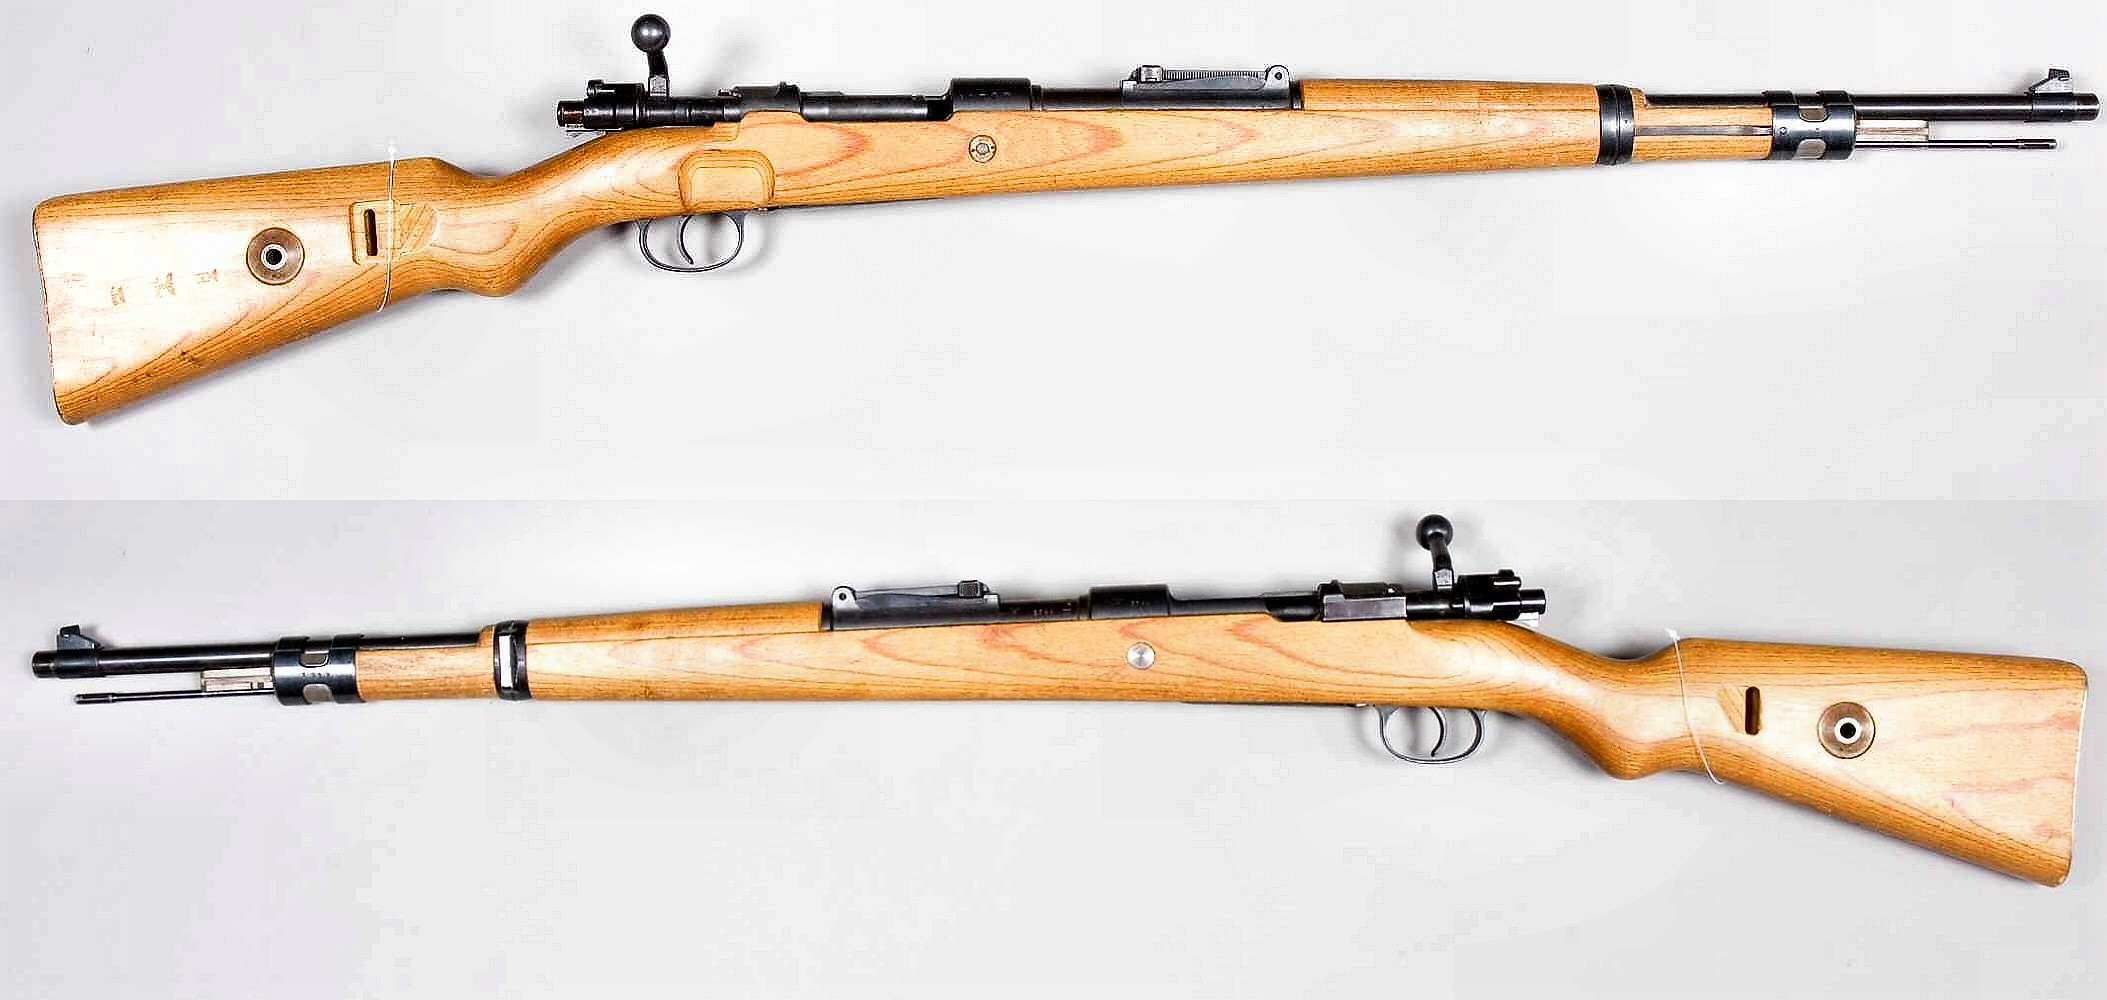 German Mauser 98k rifle